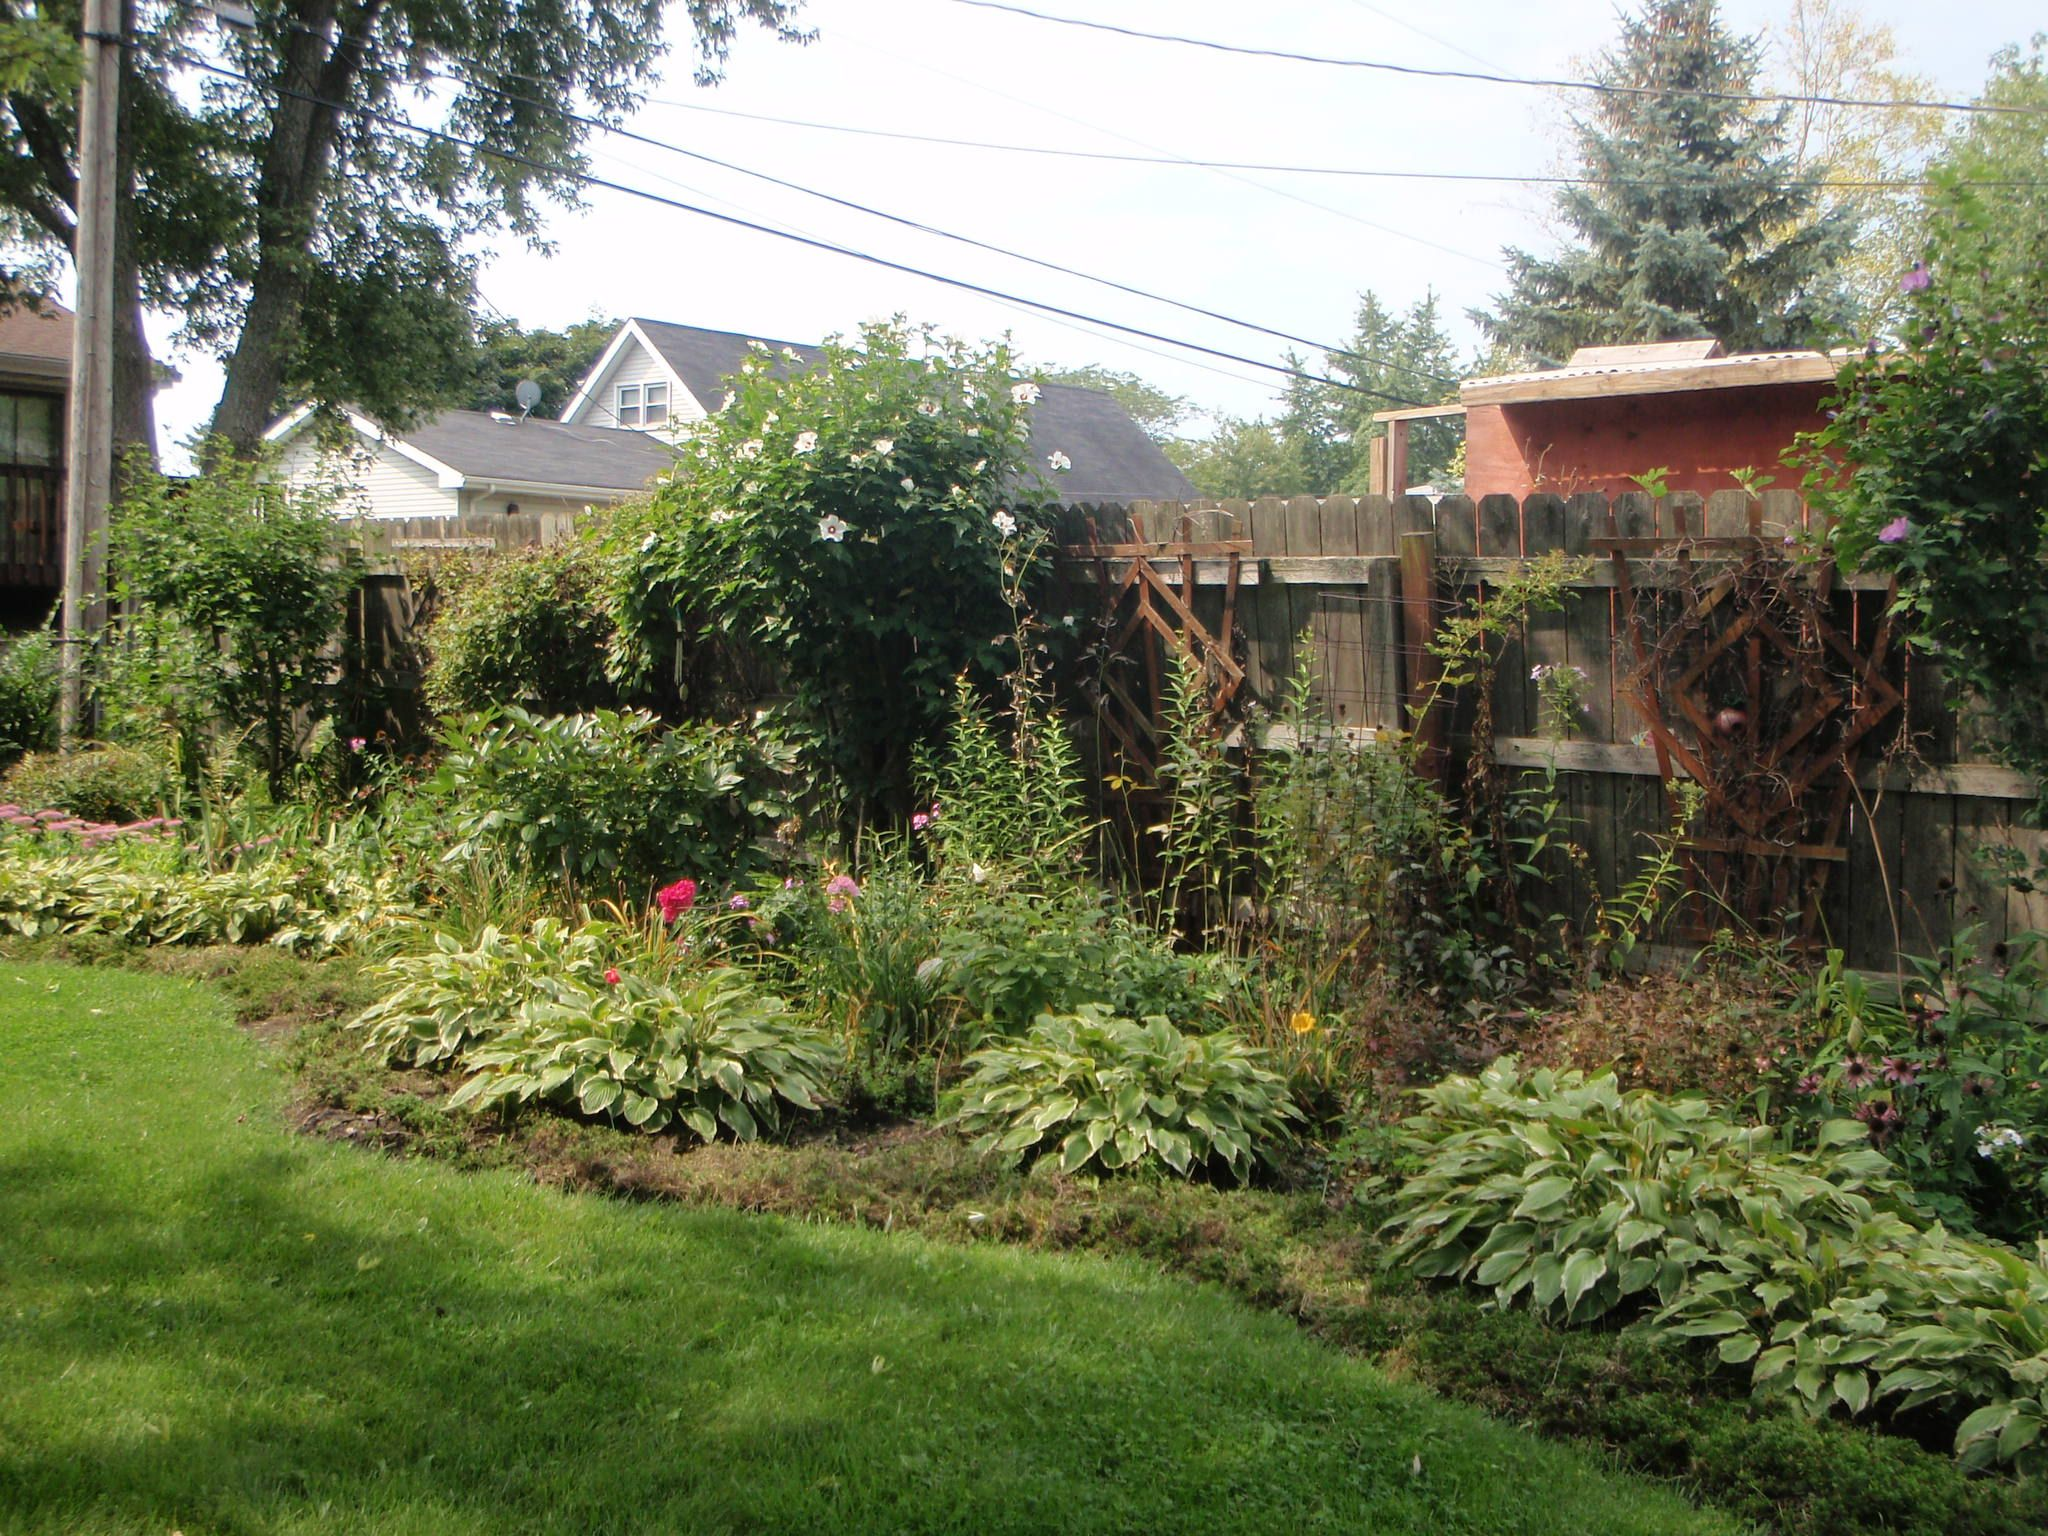 Fertilize A Lawn Jerry Baker Author Of The Impatient Gardener Suggests Mixin Outdoor Gardens Landscaping Backyard Garden Landscape Modern Garden Landscaping